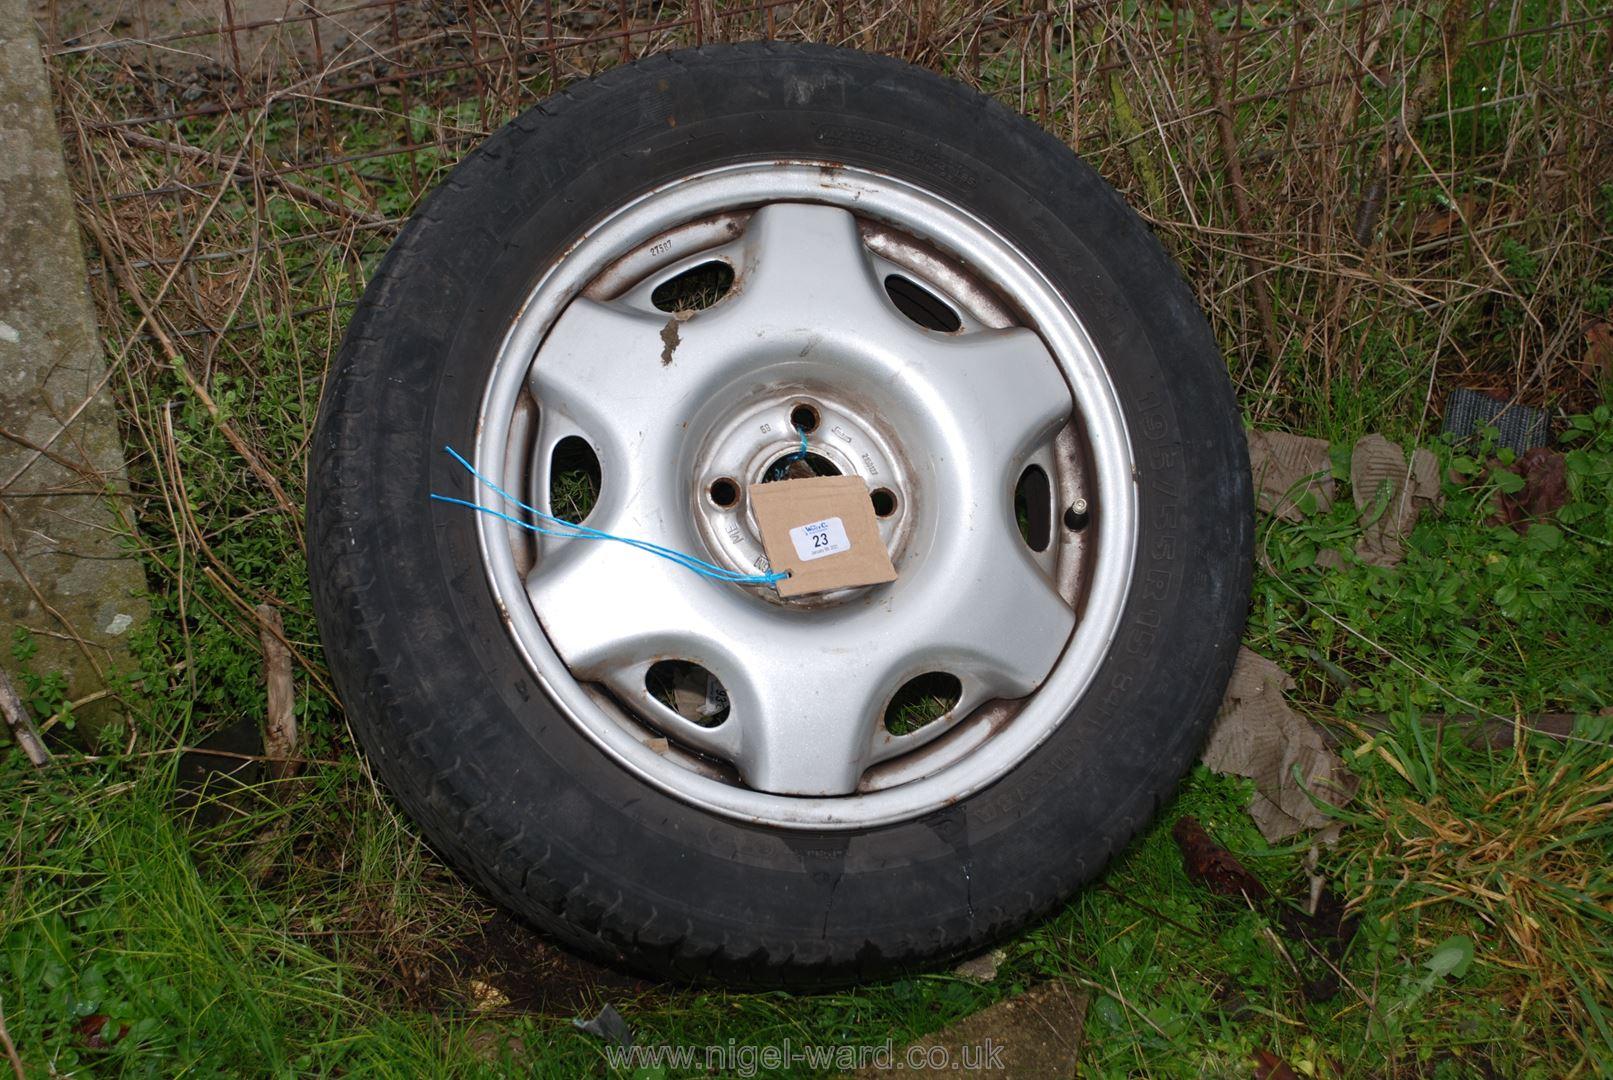 195/55 R15 tyre on a General Motors four stud rim